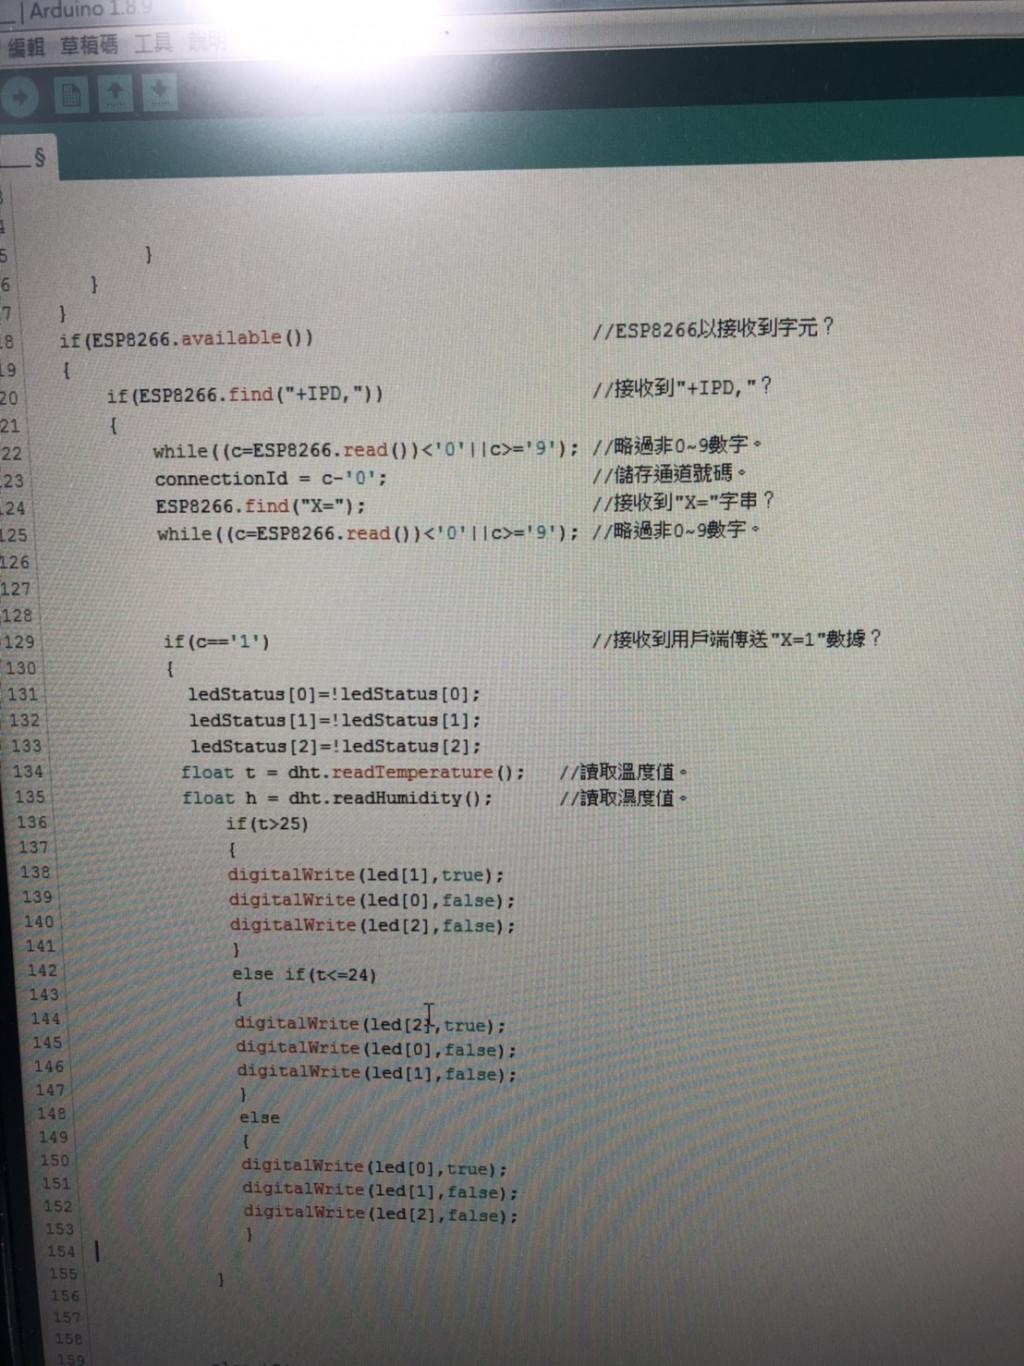 https://ithelp.ithome.com.tw/upload/images/20191225/201235028l3HAUkBfi.jpg